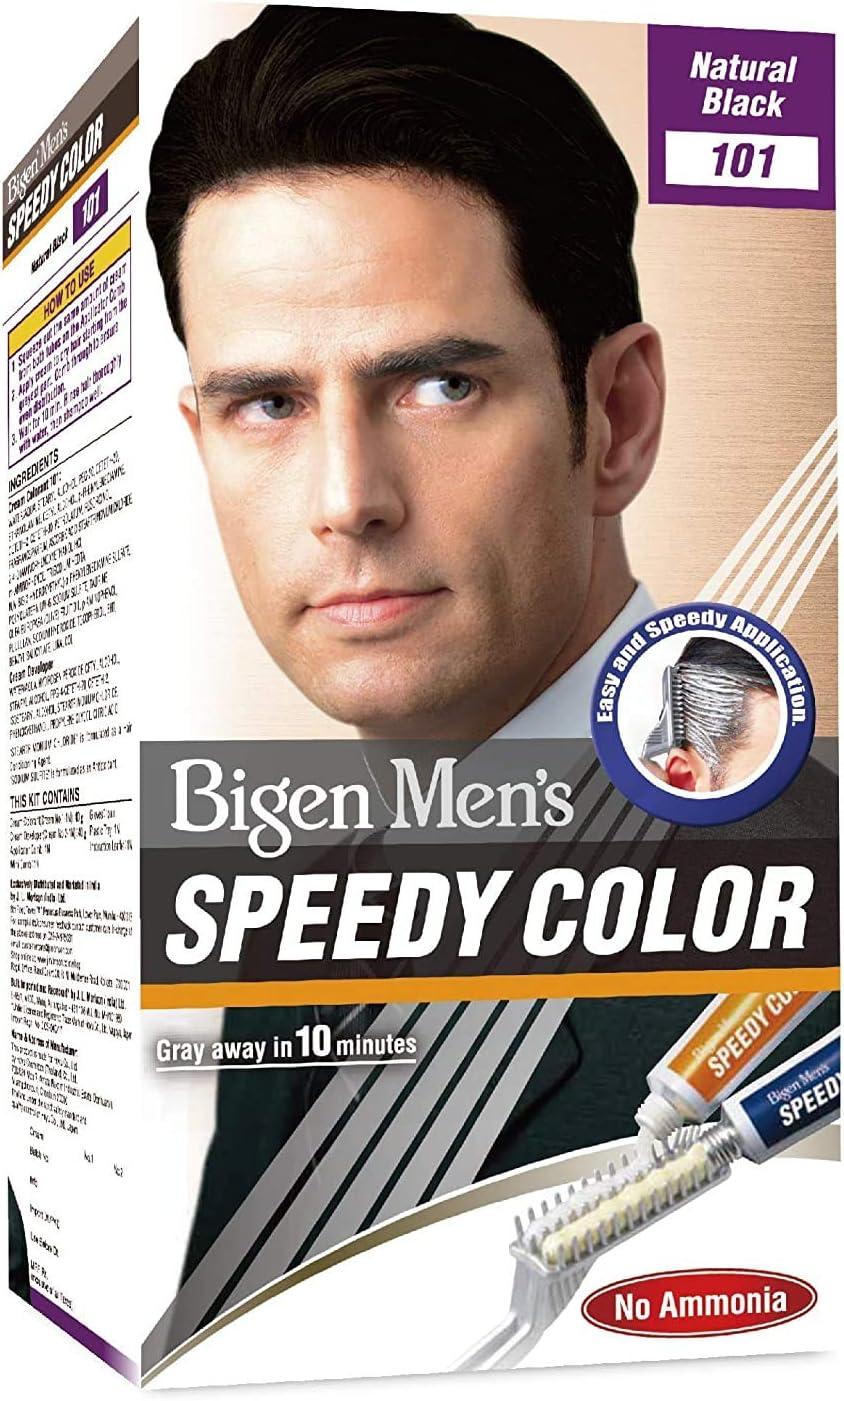 Bigen Mens Speedy Colour (Natural Black) 101